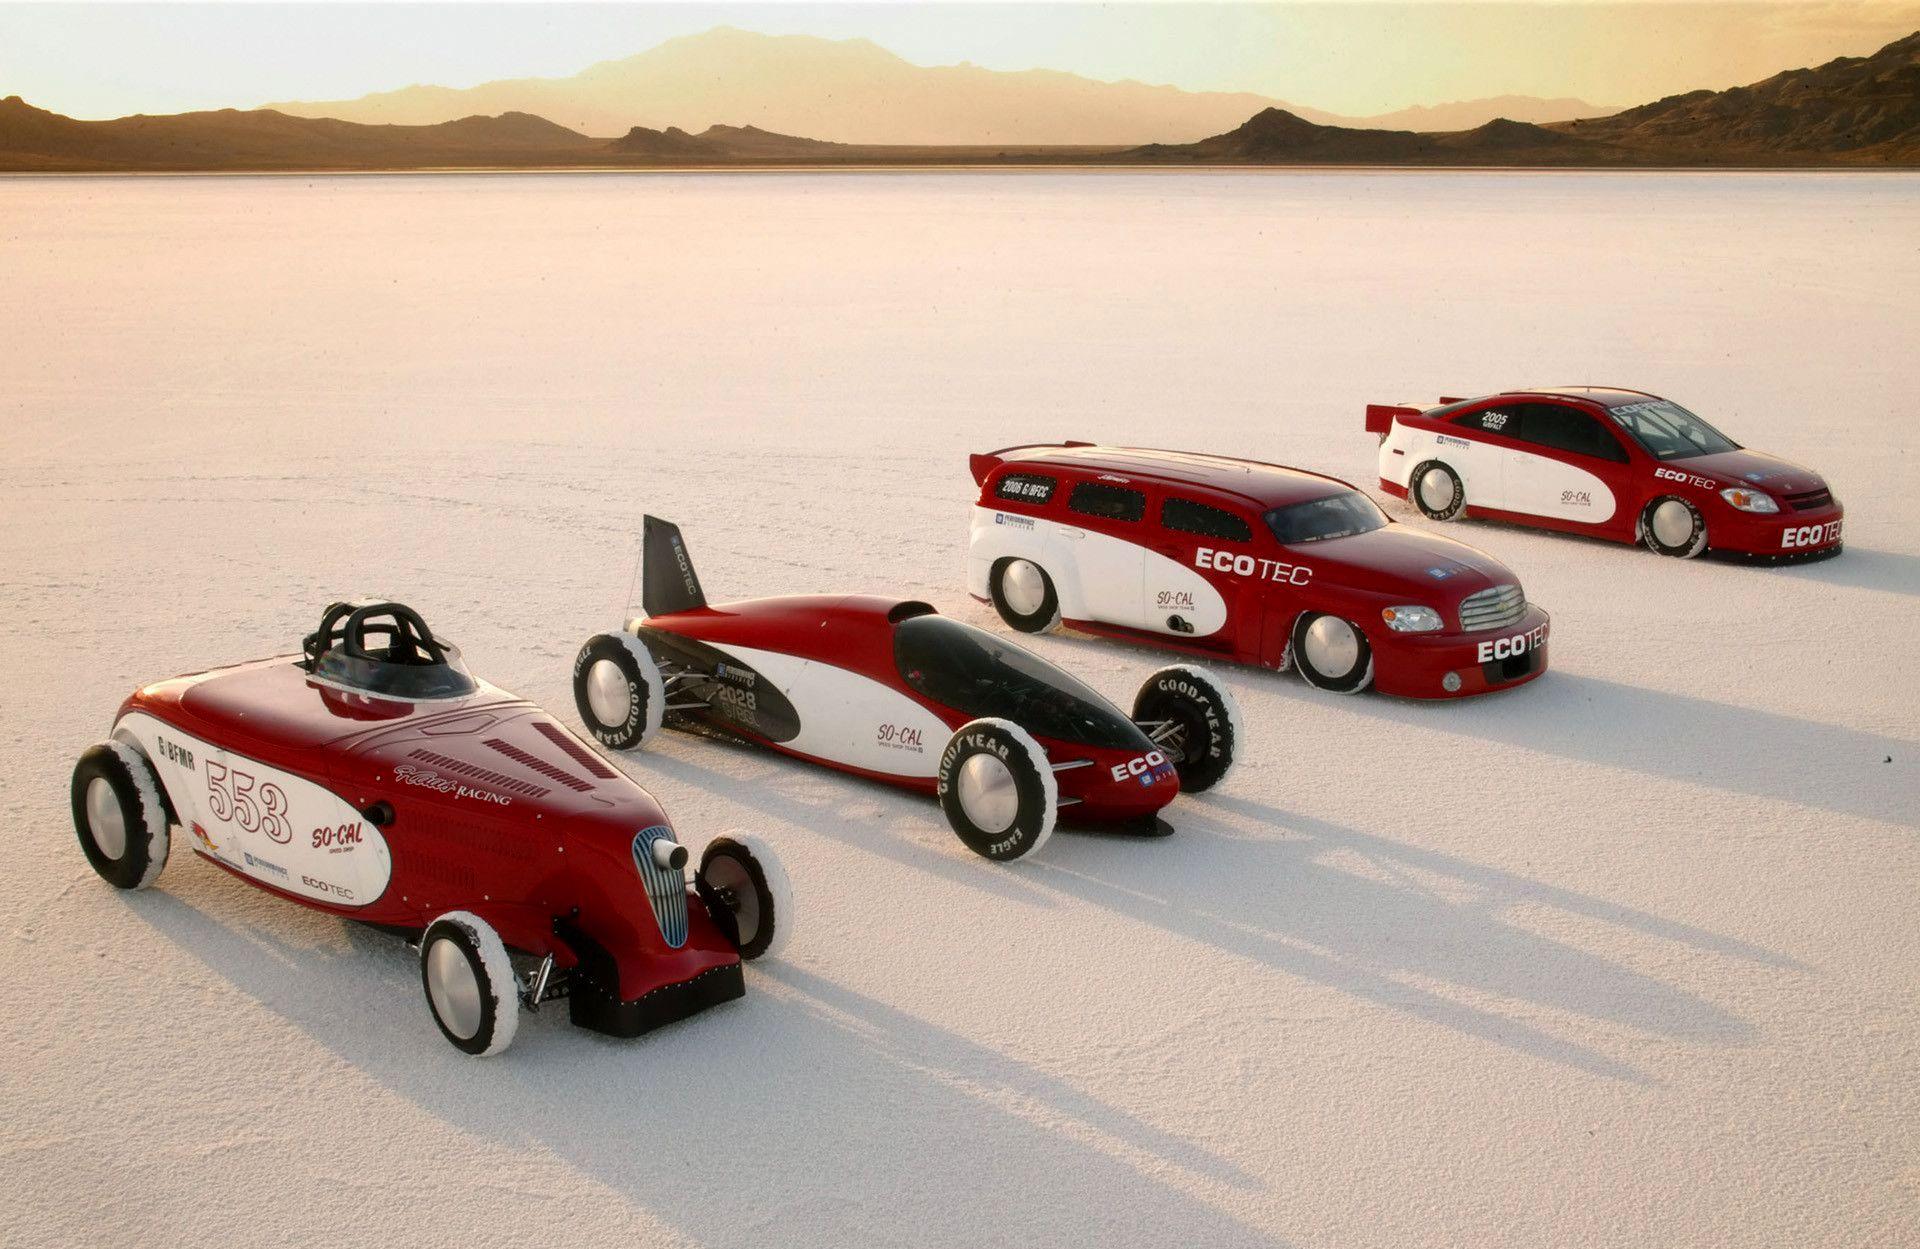 10-pete-chapouris-so-cal-speed-shop-pete-jakes-pc3g-bio-salt-flats-gm-belly-tank-lakester.jpg